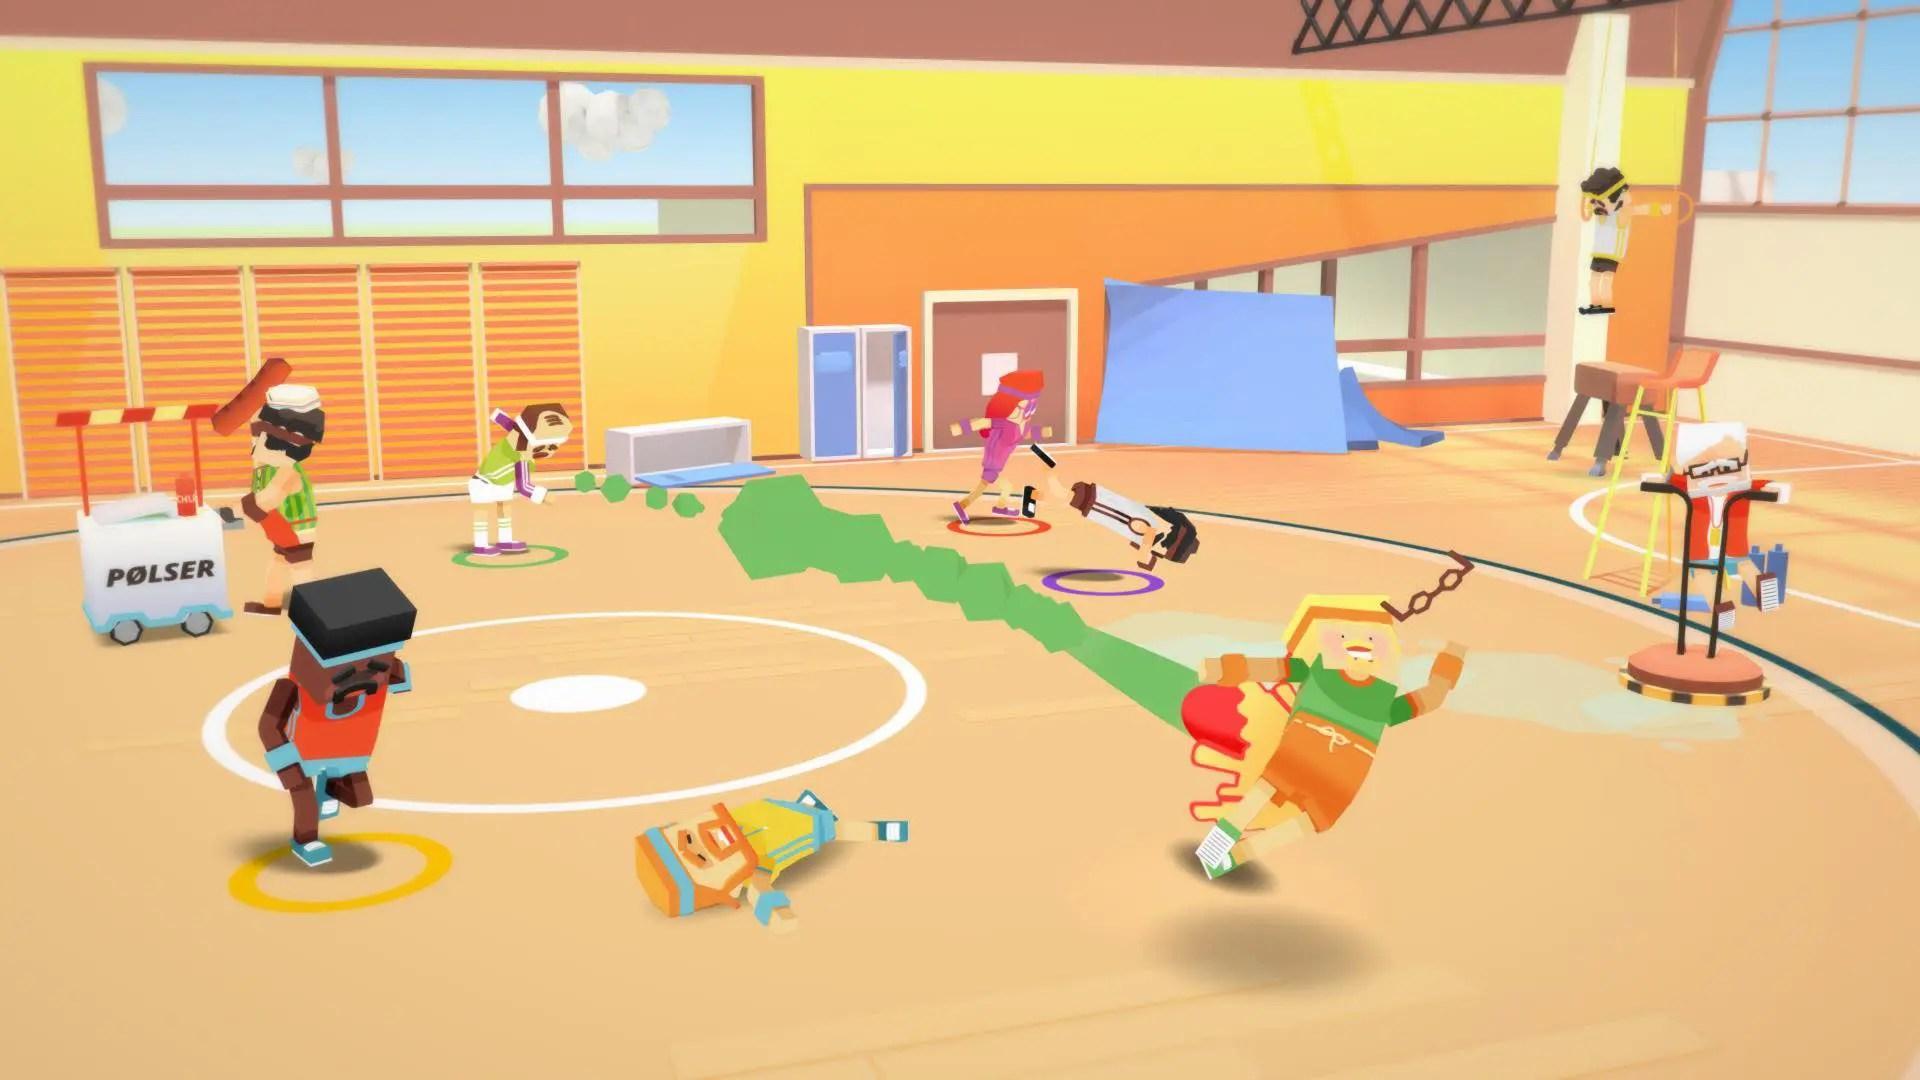 stikbold-a-dodgeball-adventure-deluxe-review-screenshot-2